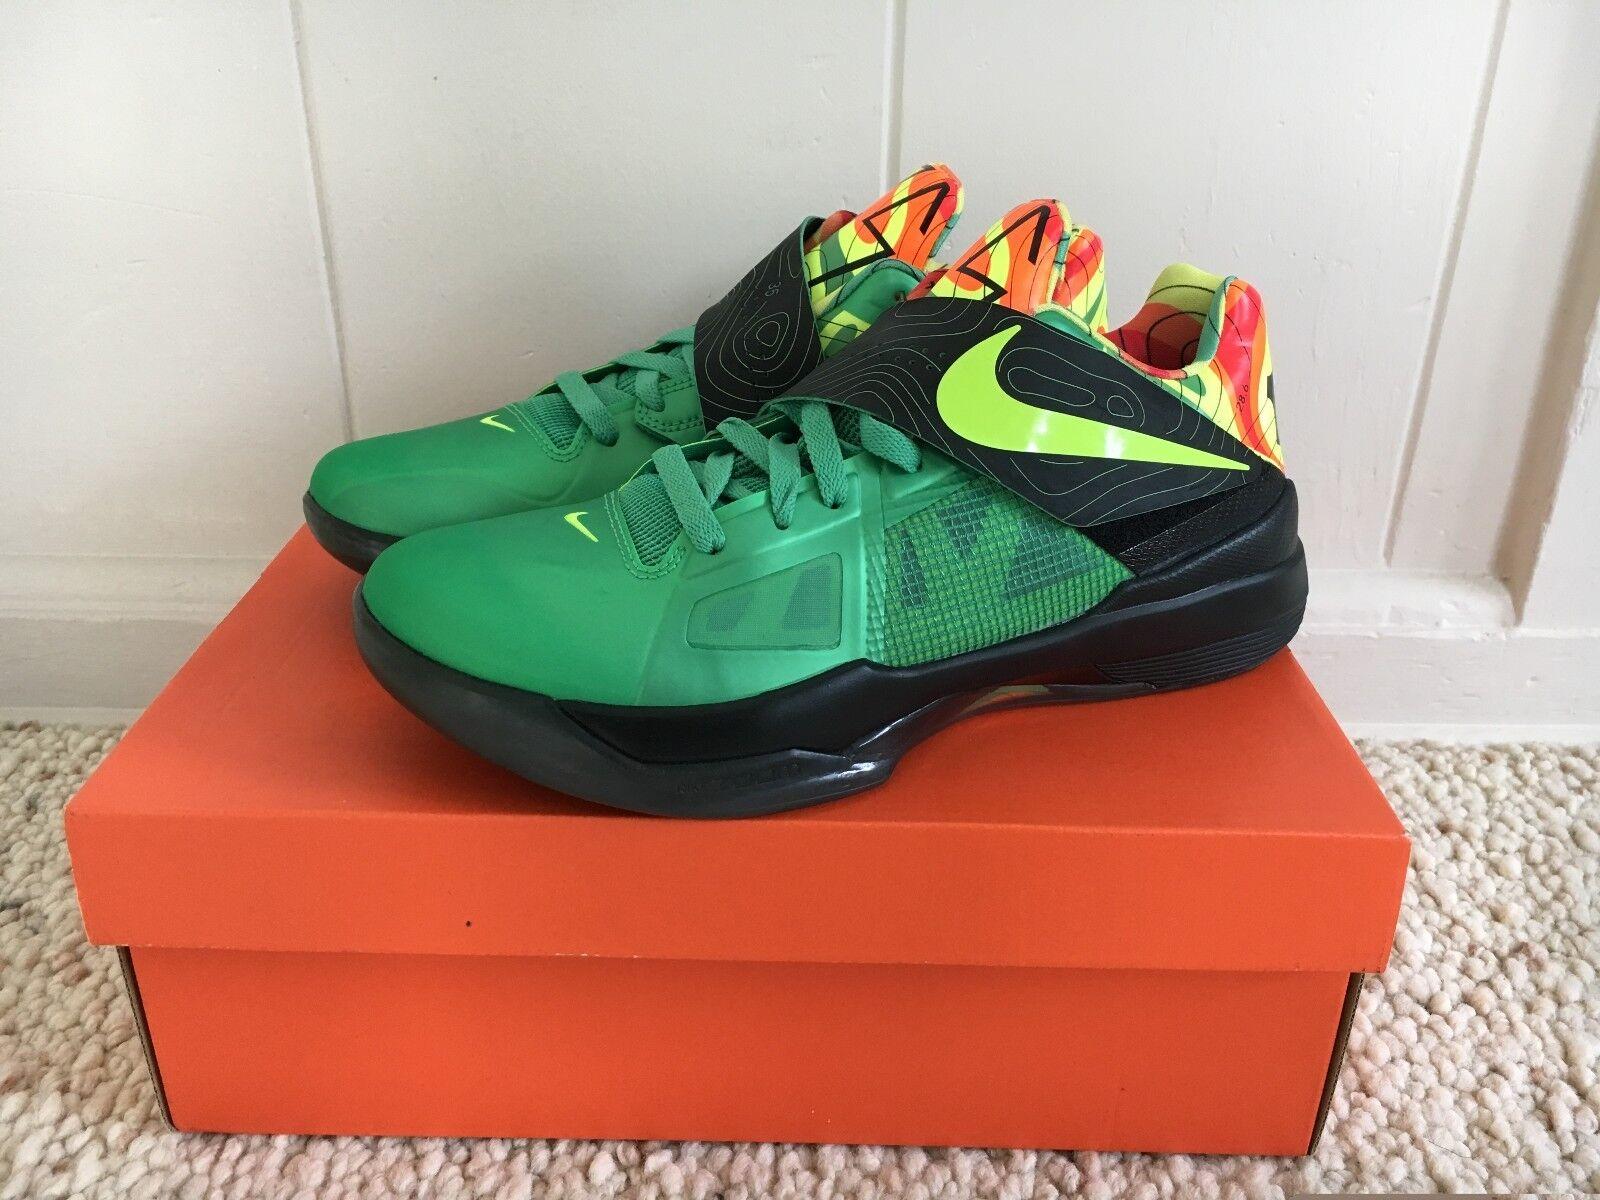 Nike Zoom KD IV 4 Weatherman DS size 9.5